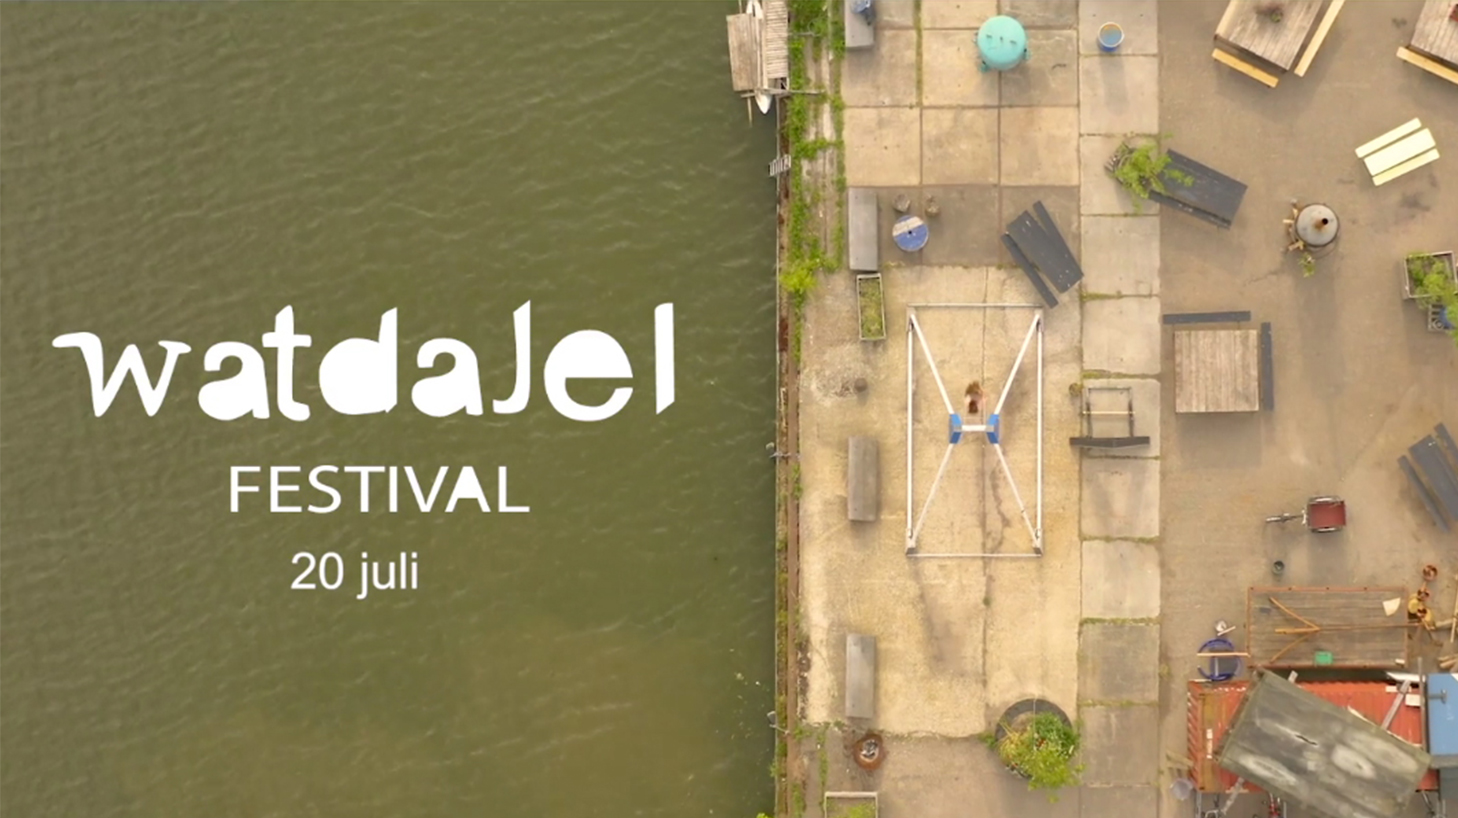 Promotieshot van Dajawel festival